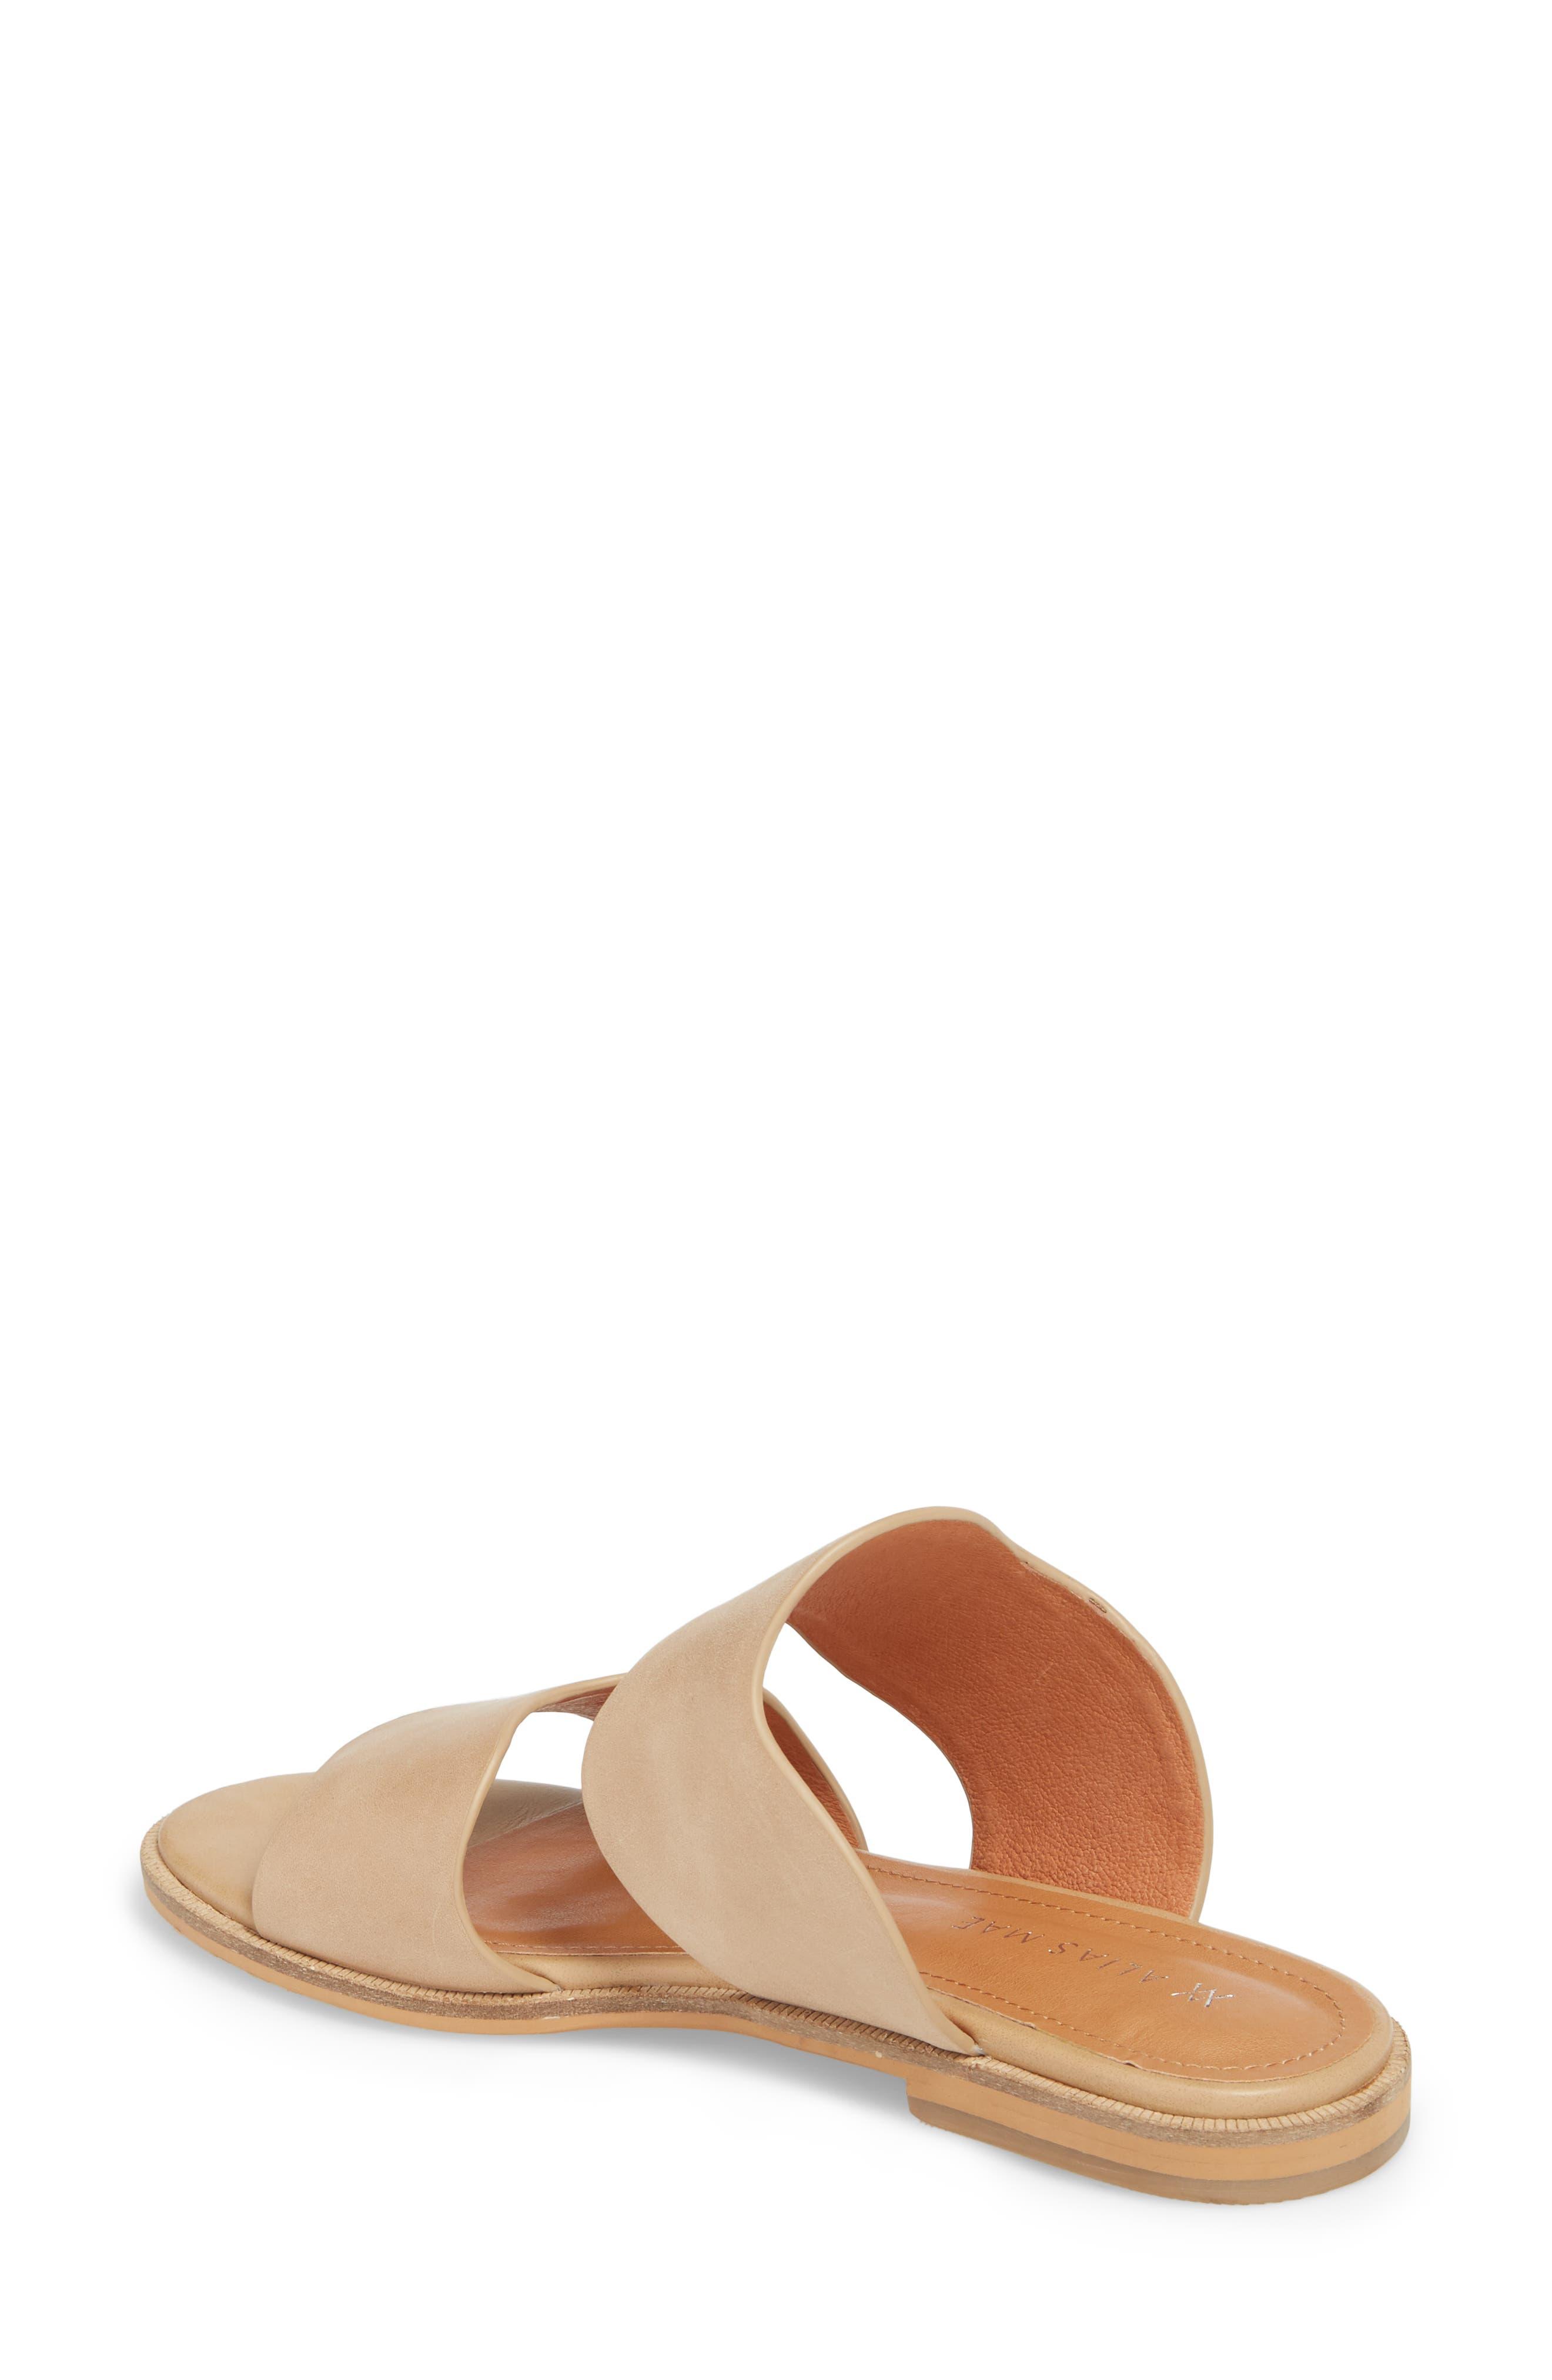 Thermos Scalloped Slide Sandal,                             Alternate thumbnail 2, color,                             250